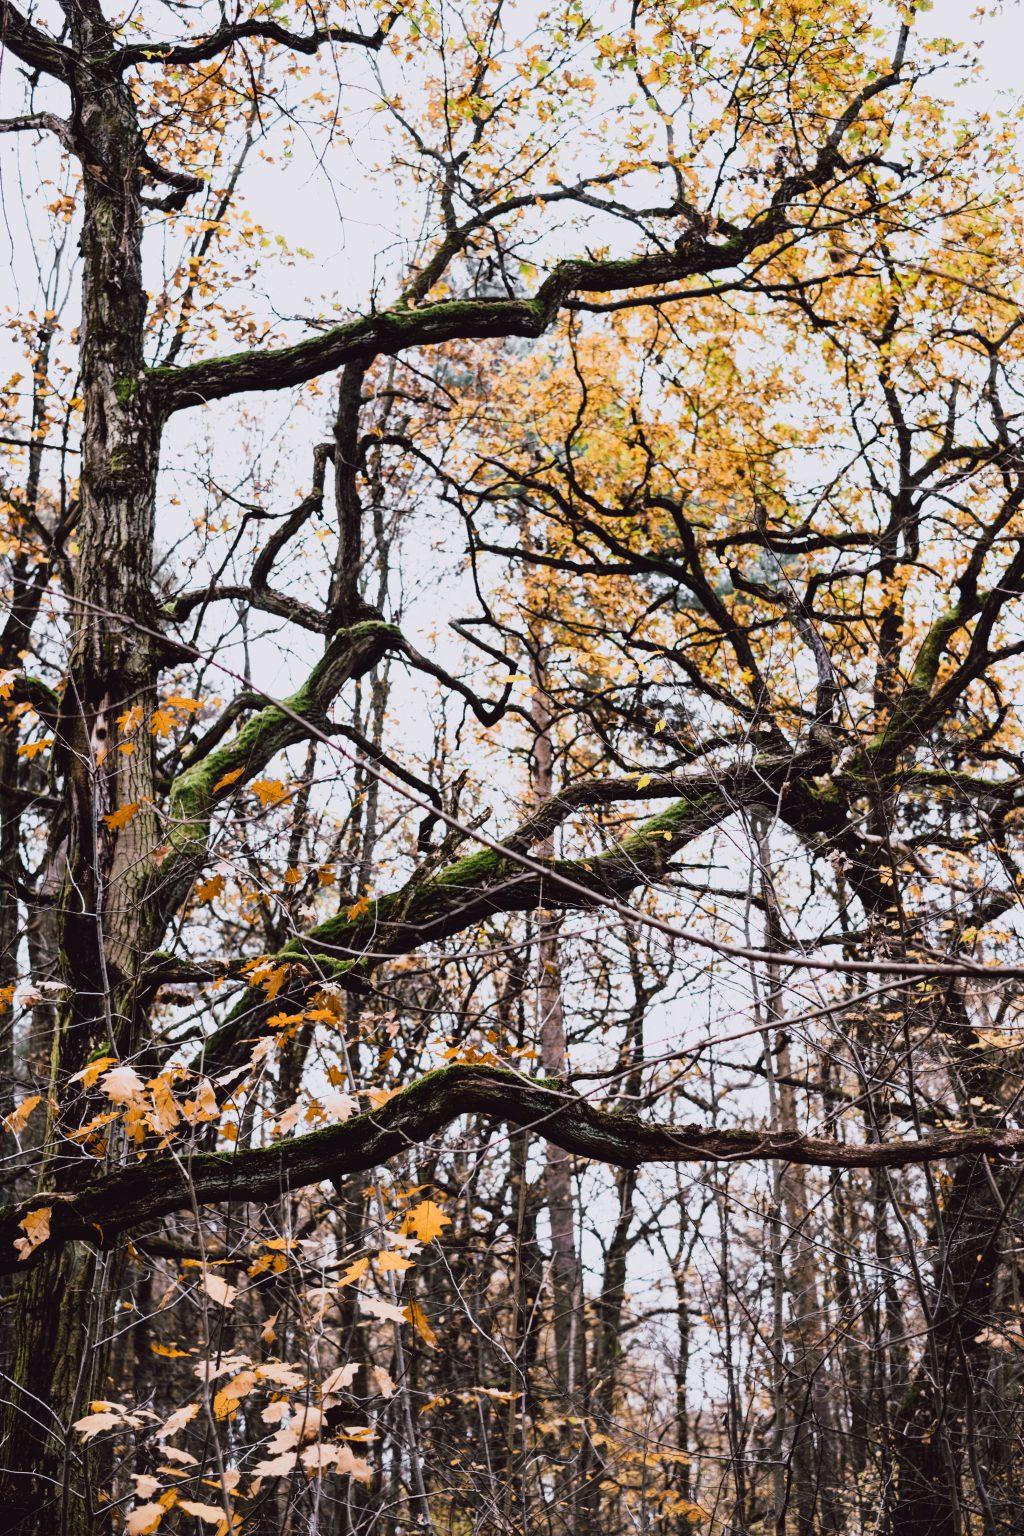 Autumn forest 2 - free stock photo